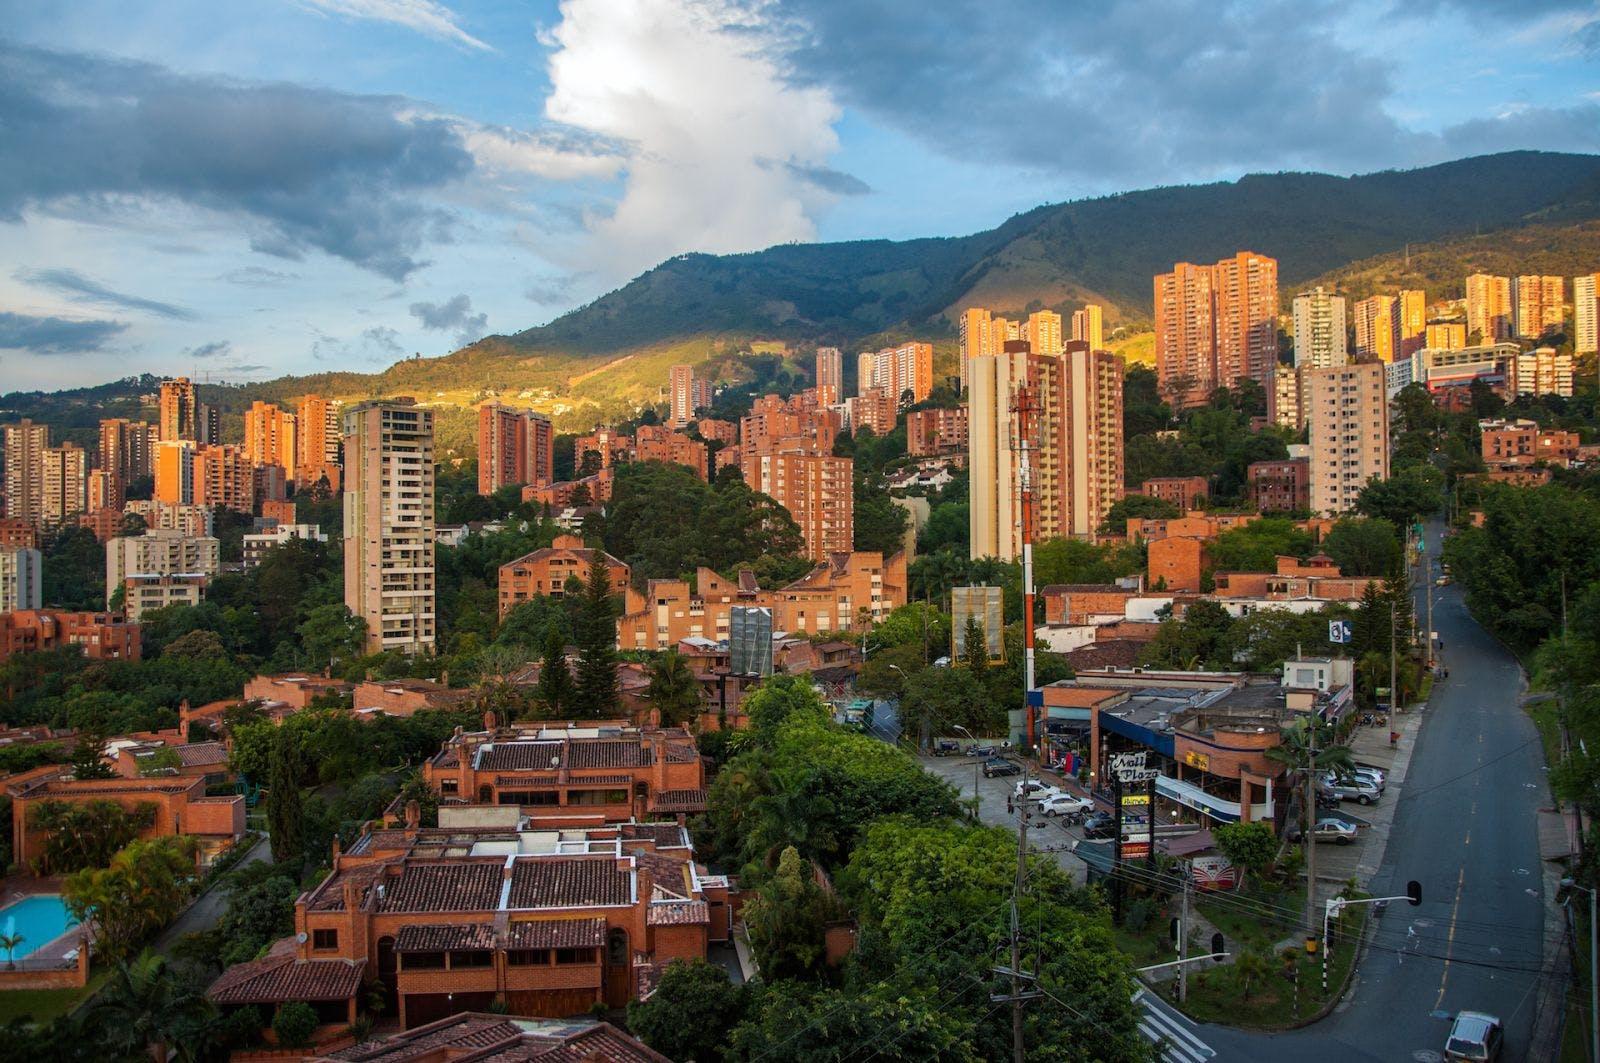 Picture of Medellin